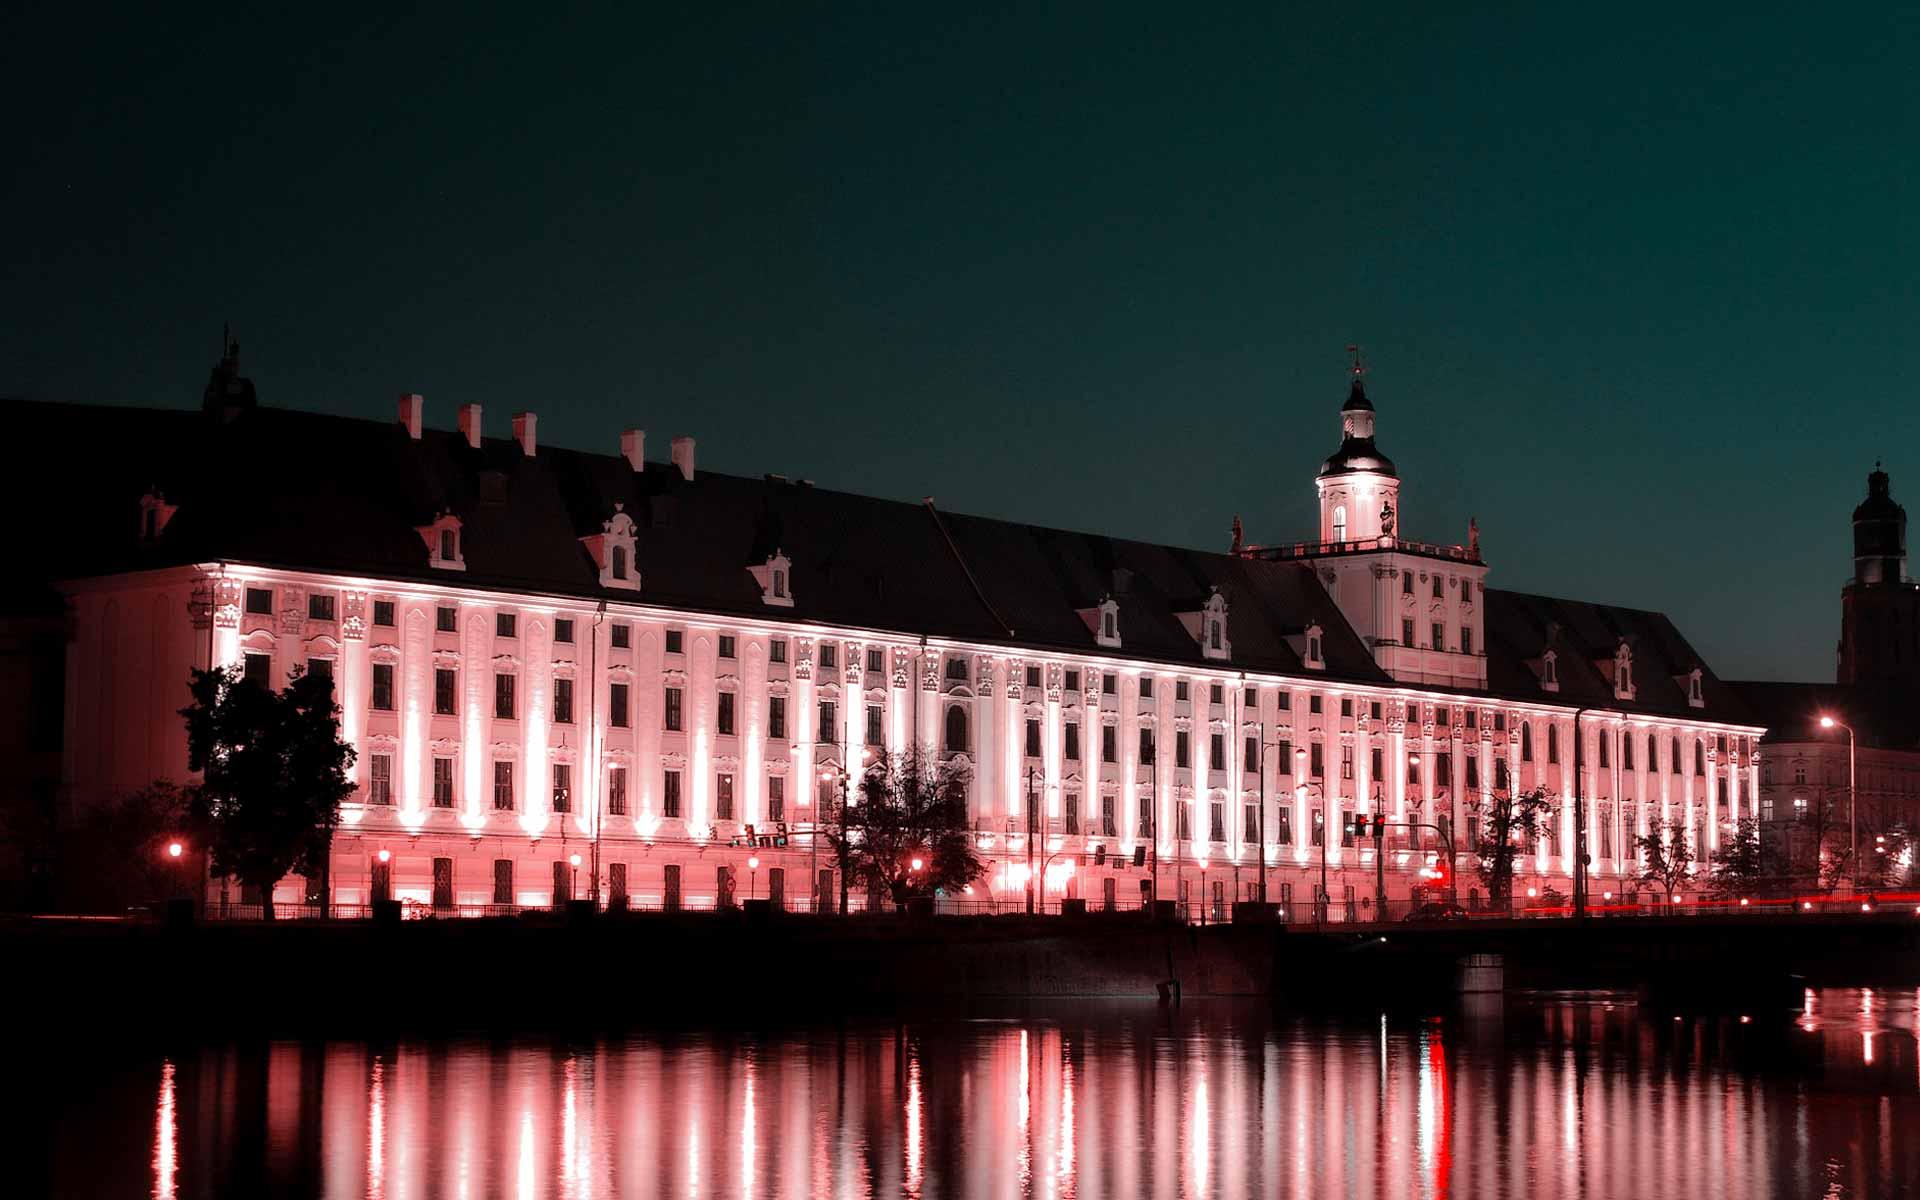 Uniwersytet Wrocławski | Universität Breslau.